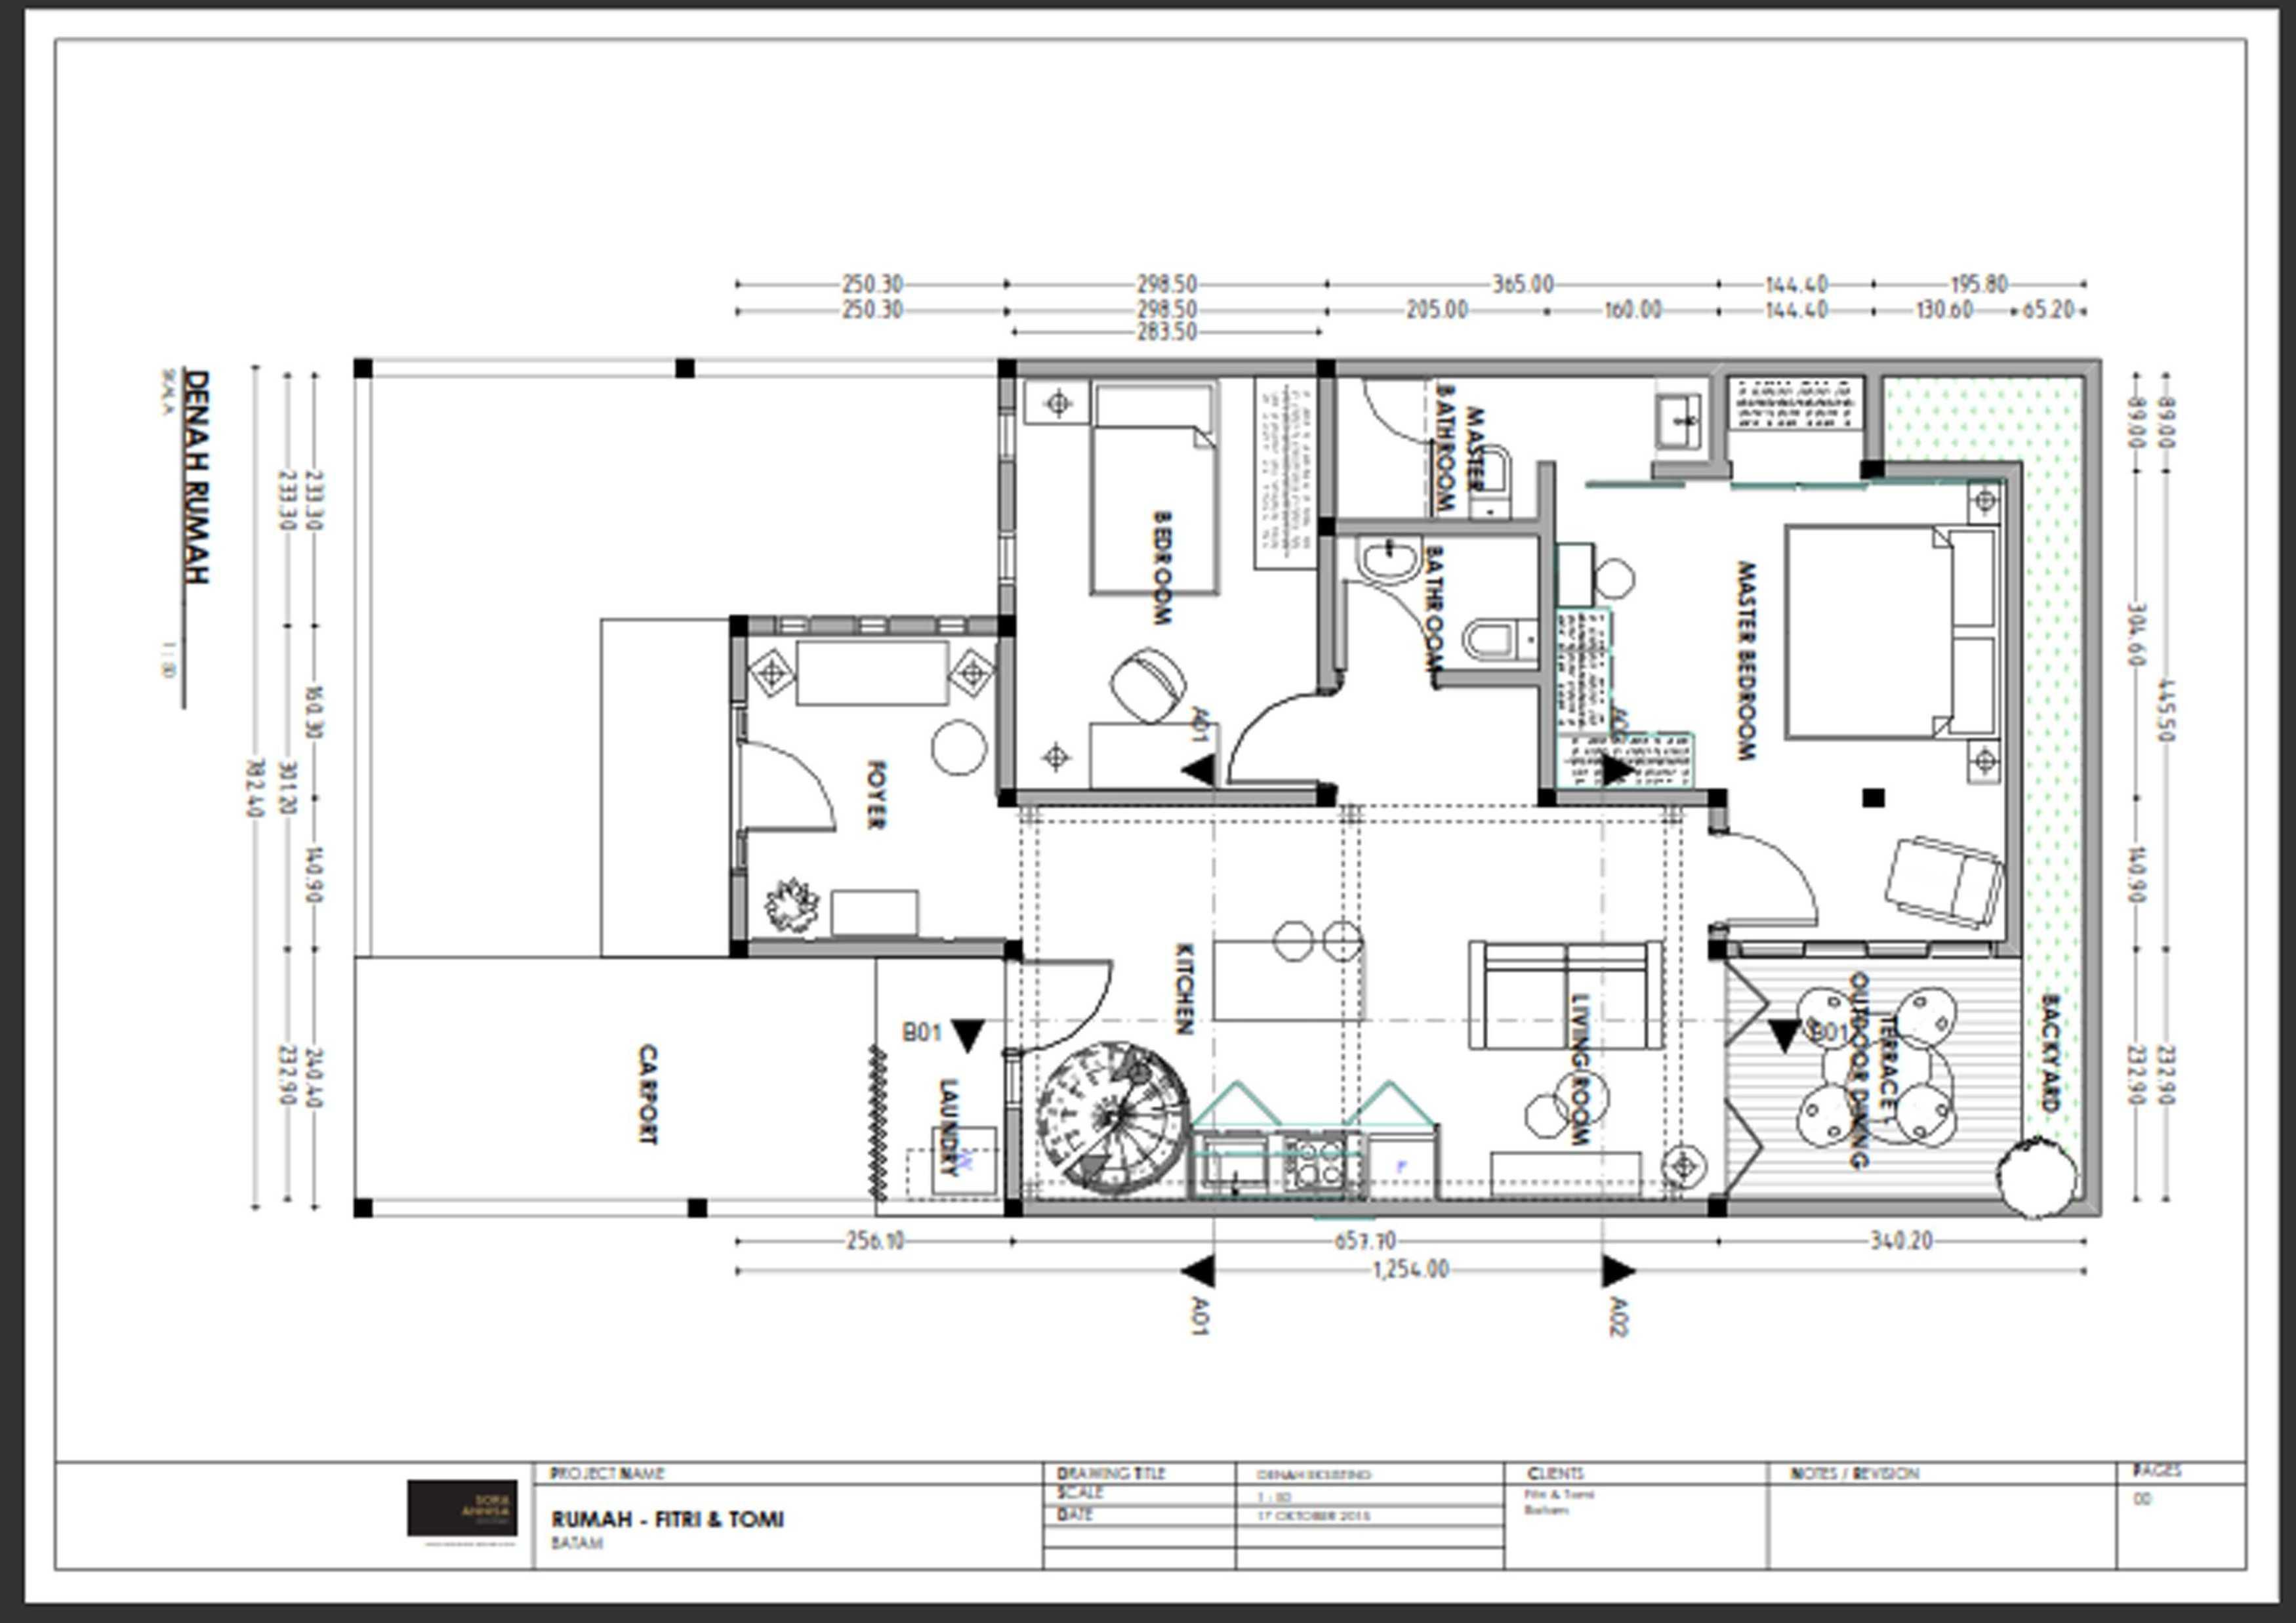 Gilbert Yohannes Voerman Fy House Kda Housing . Batam Centre Kda Housing . Batam Centre Denah-20160322-Wa0037 Kontemporer  27177